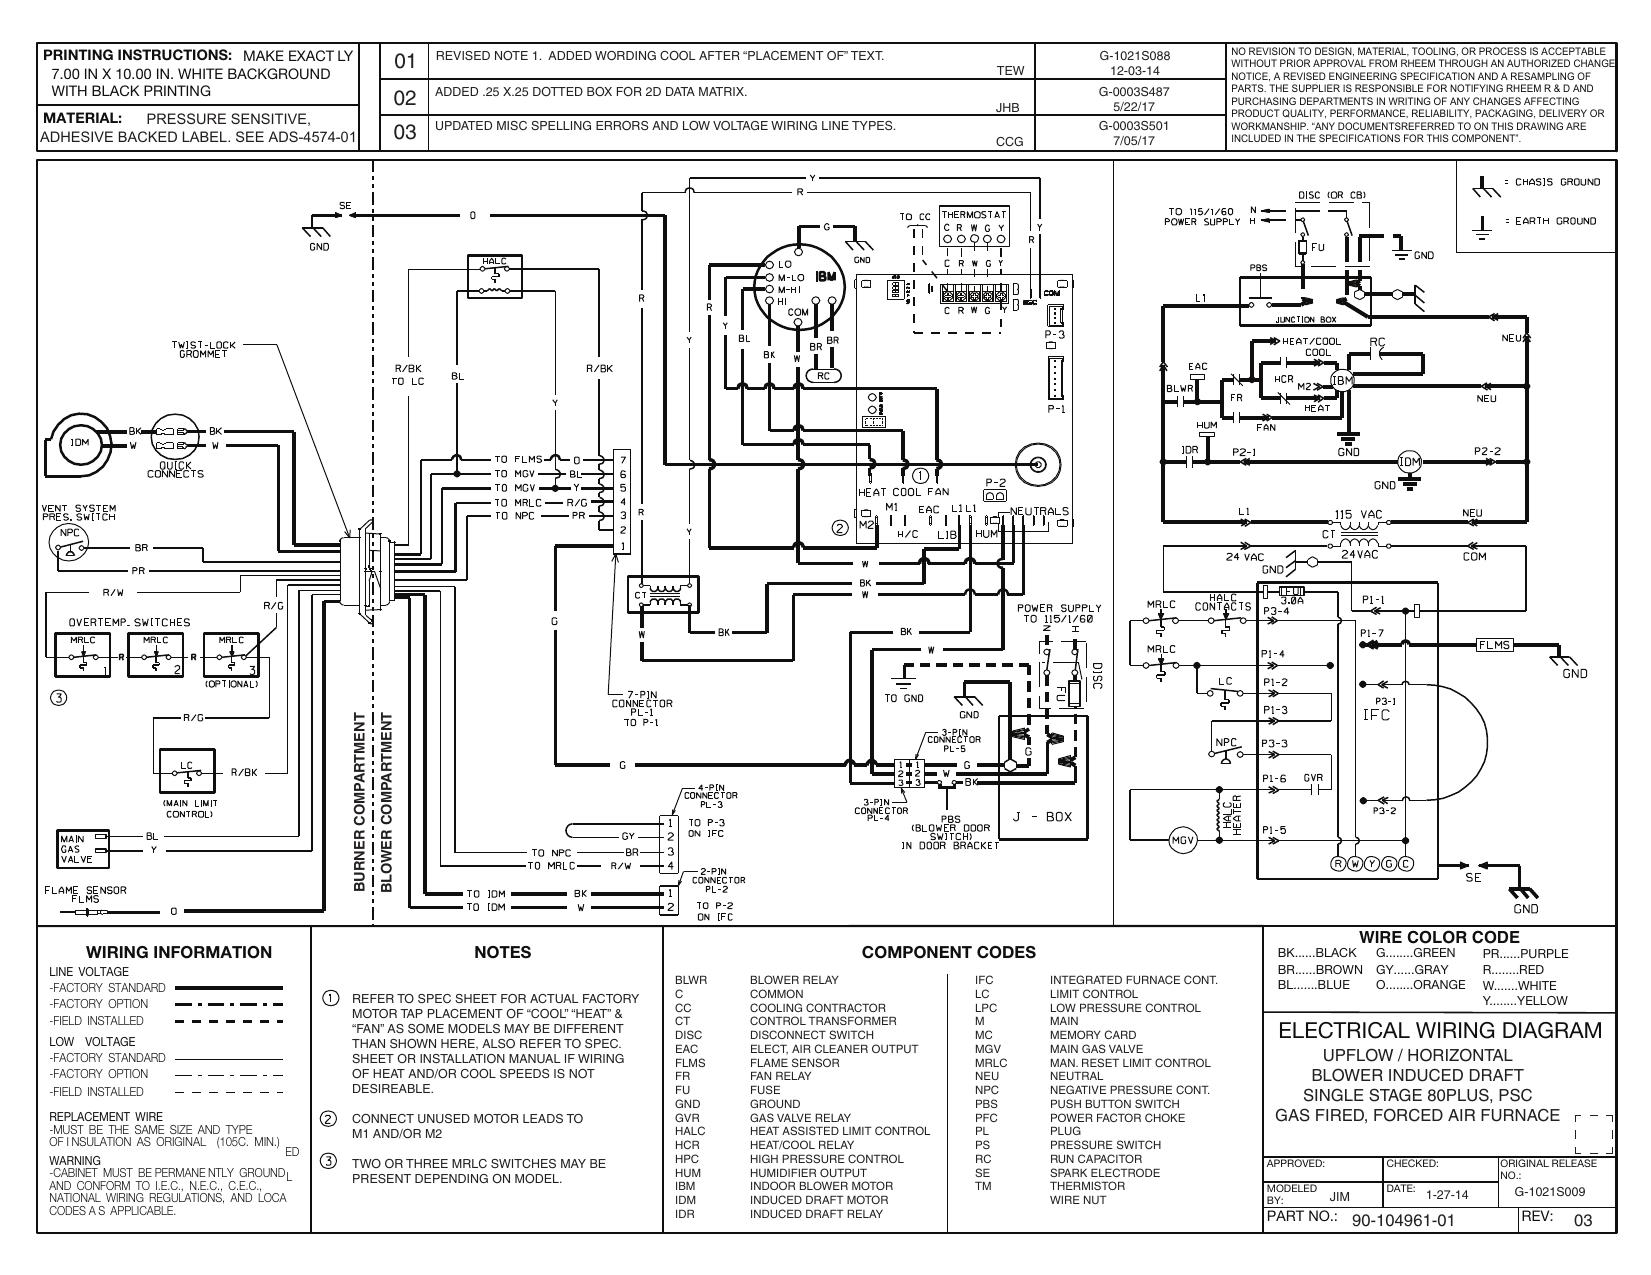 electrical wiring diagram | manualzz.com on